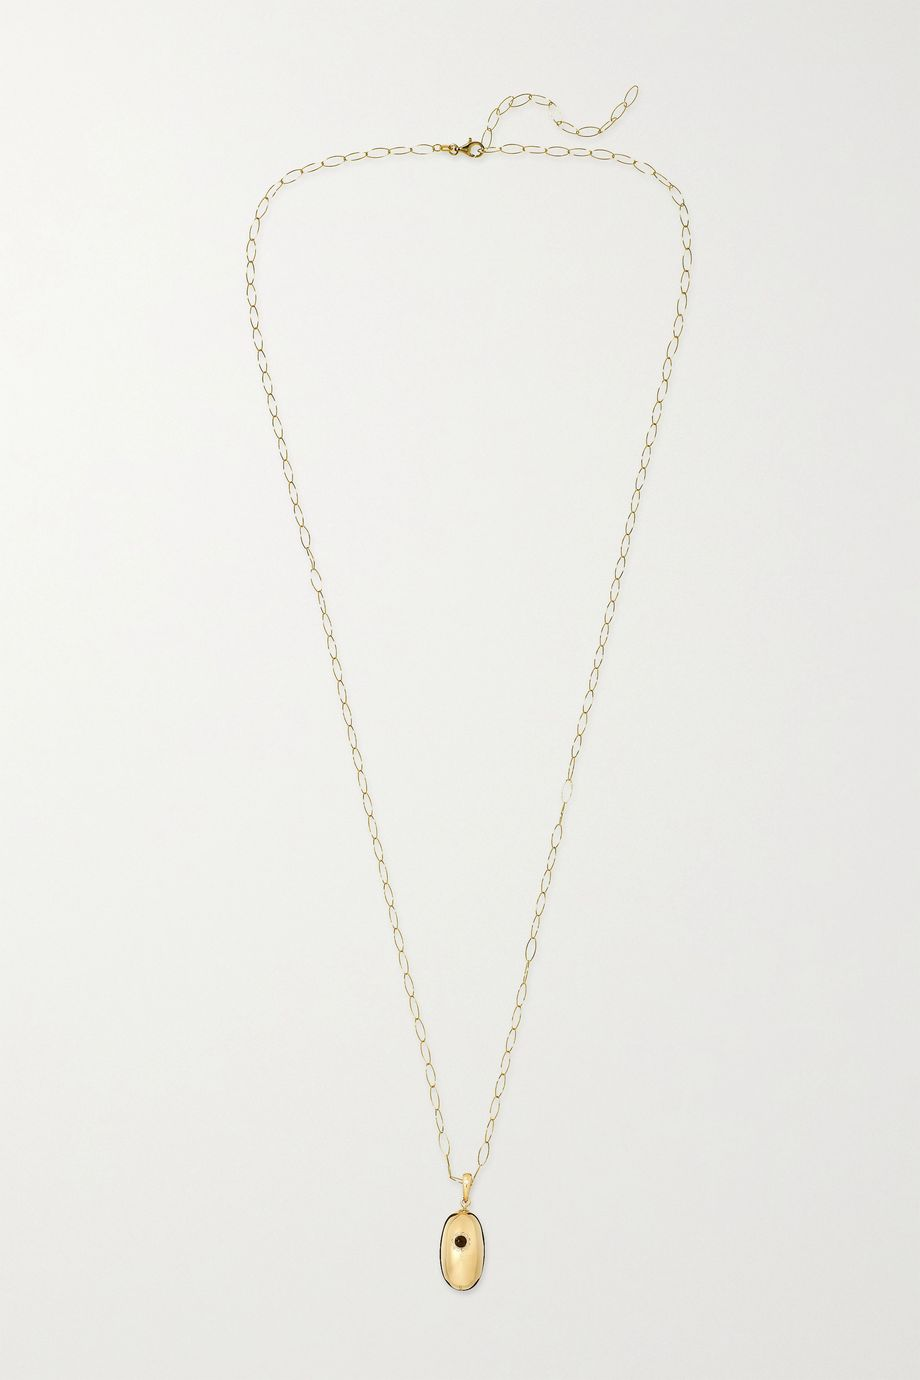 Loquet + Chantal Conrad Lumiere 14 and 18-karat gold necklace